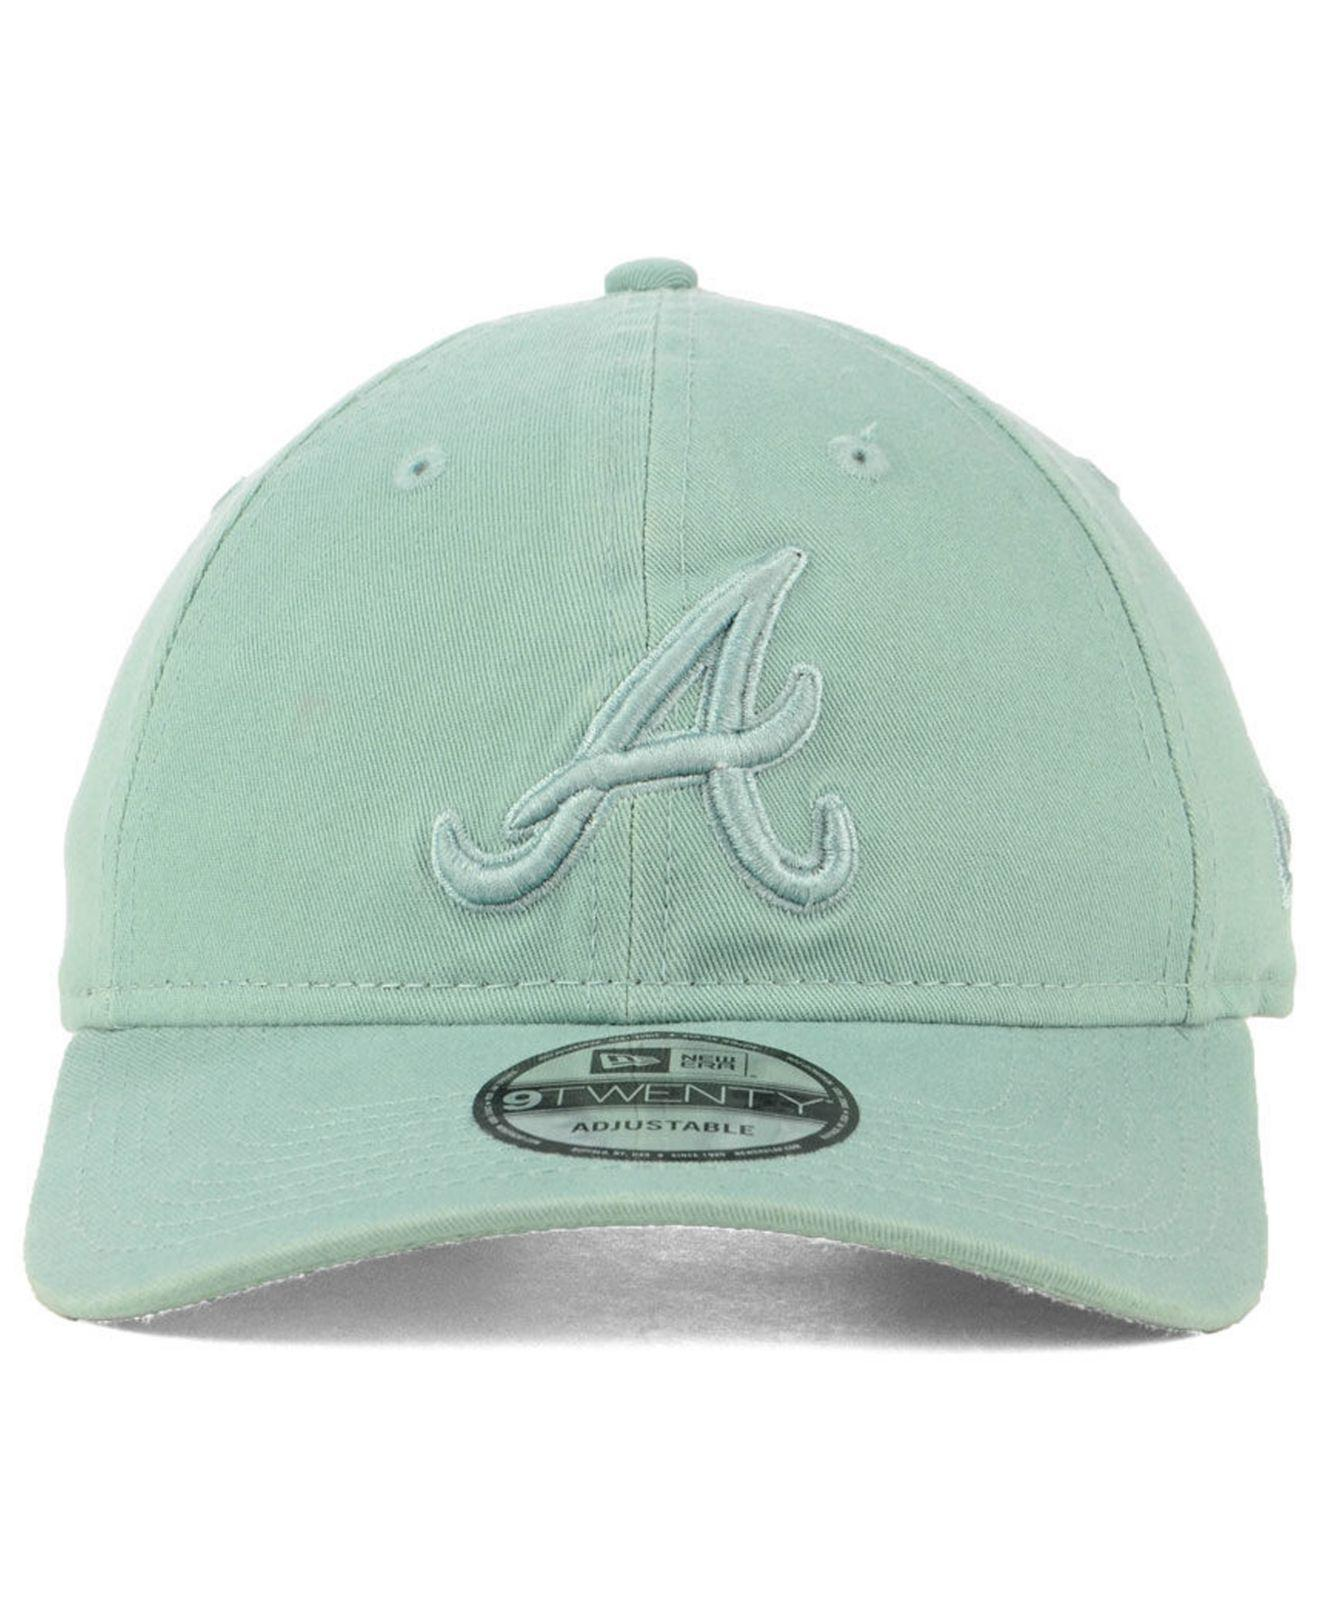 timeless design 6d3ad d5fc0 ... cheap lyst ktz atlanta braves spring classic 9twenty cap in blue for men  b0029 bb369